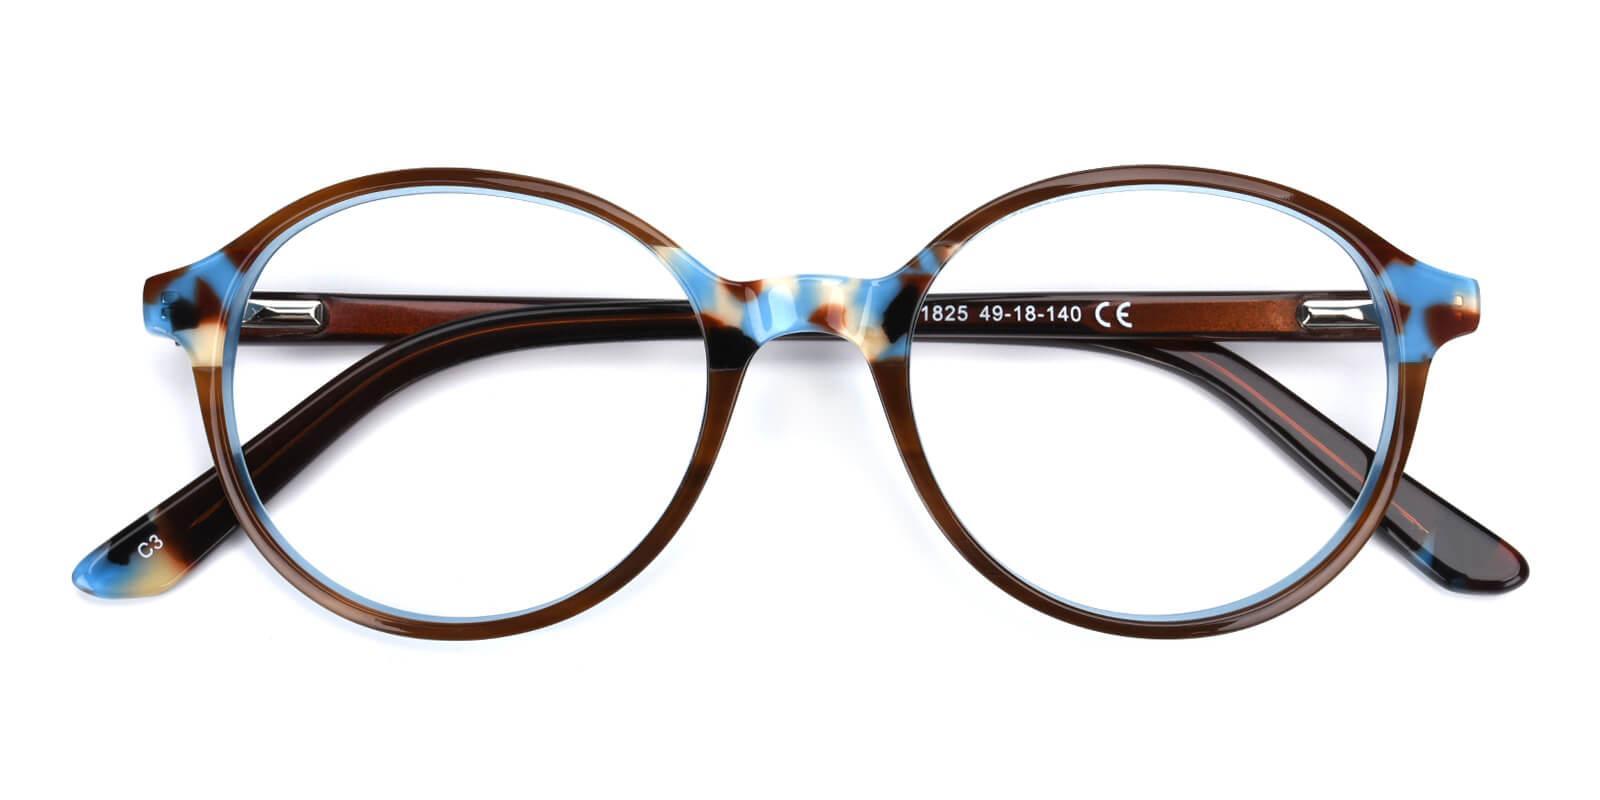 Giselle-Brown-Oval-Acetate-Eyeglasses-detail